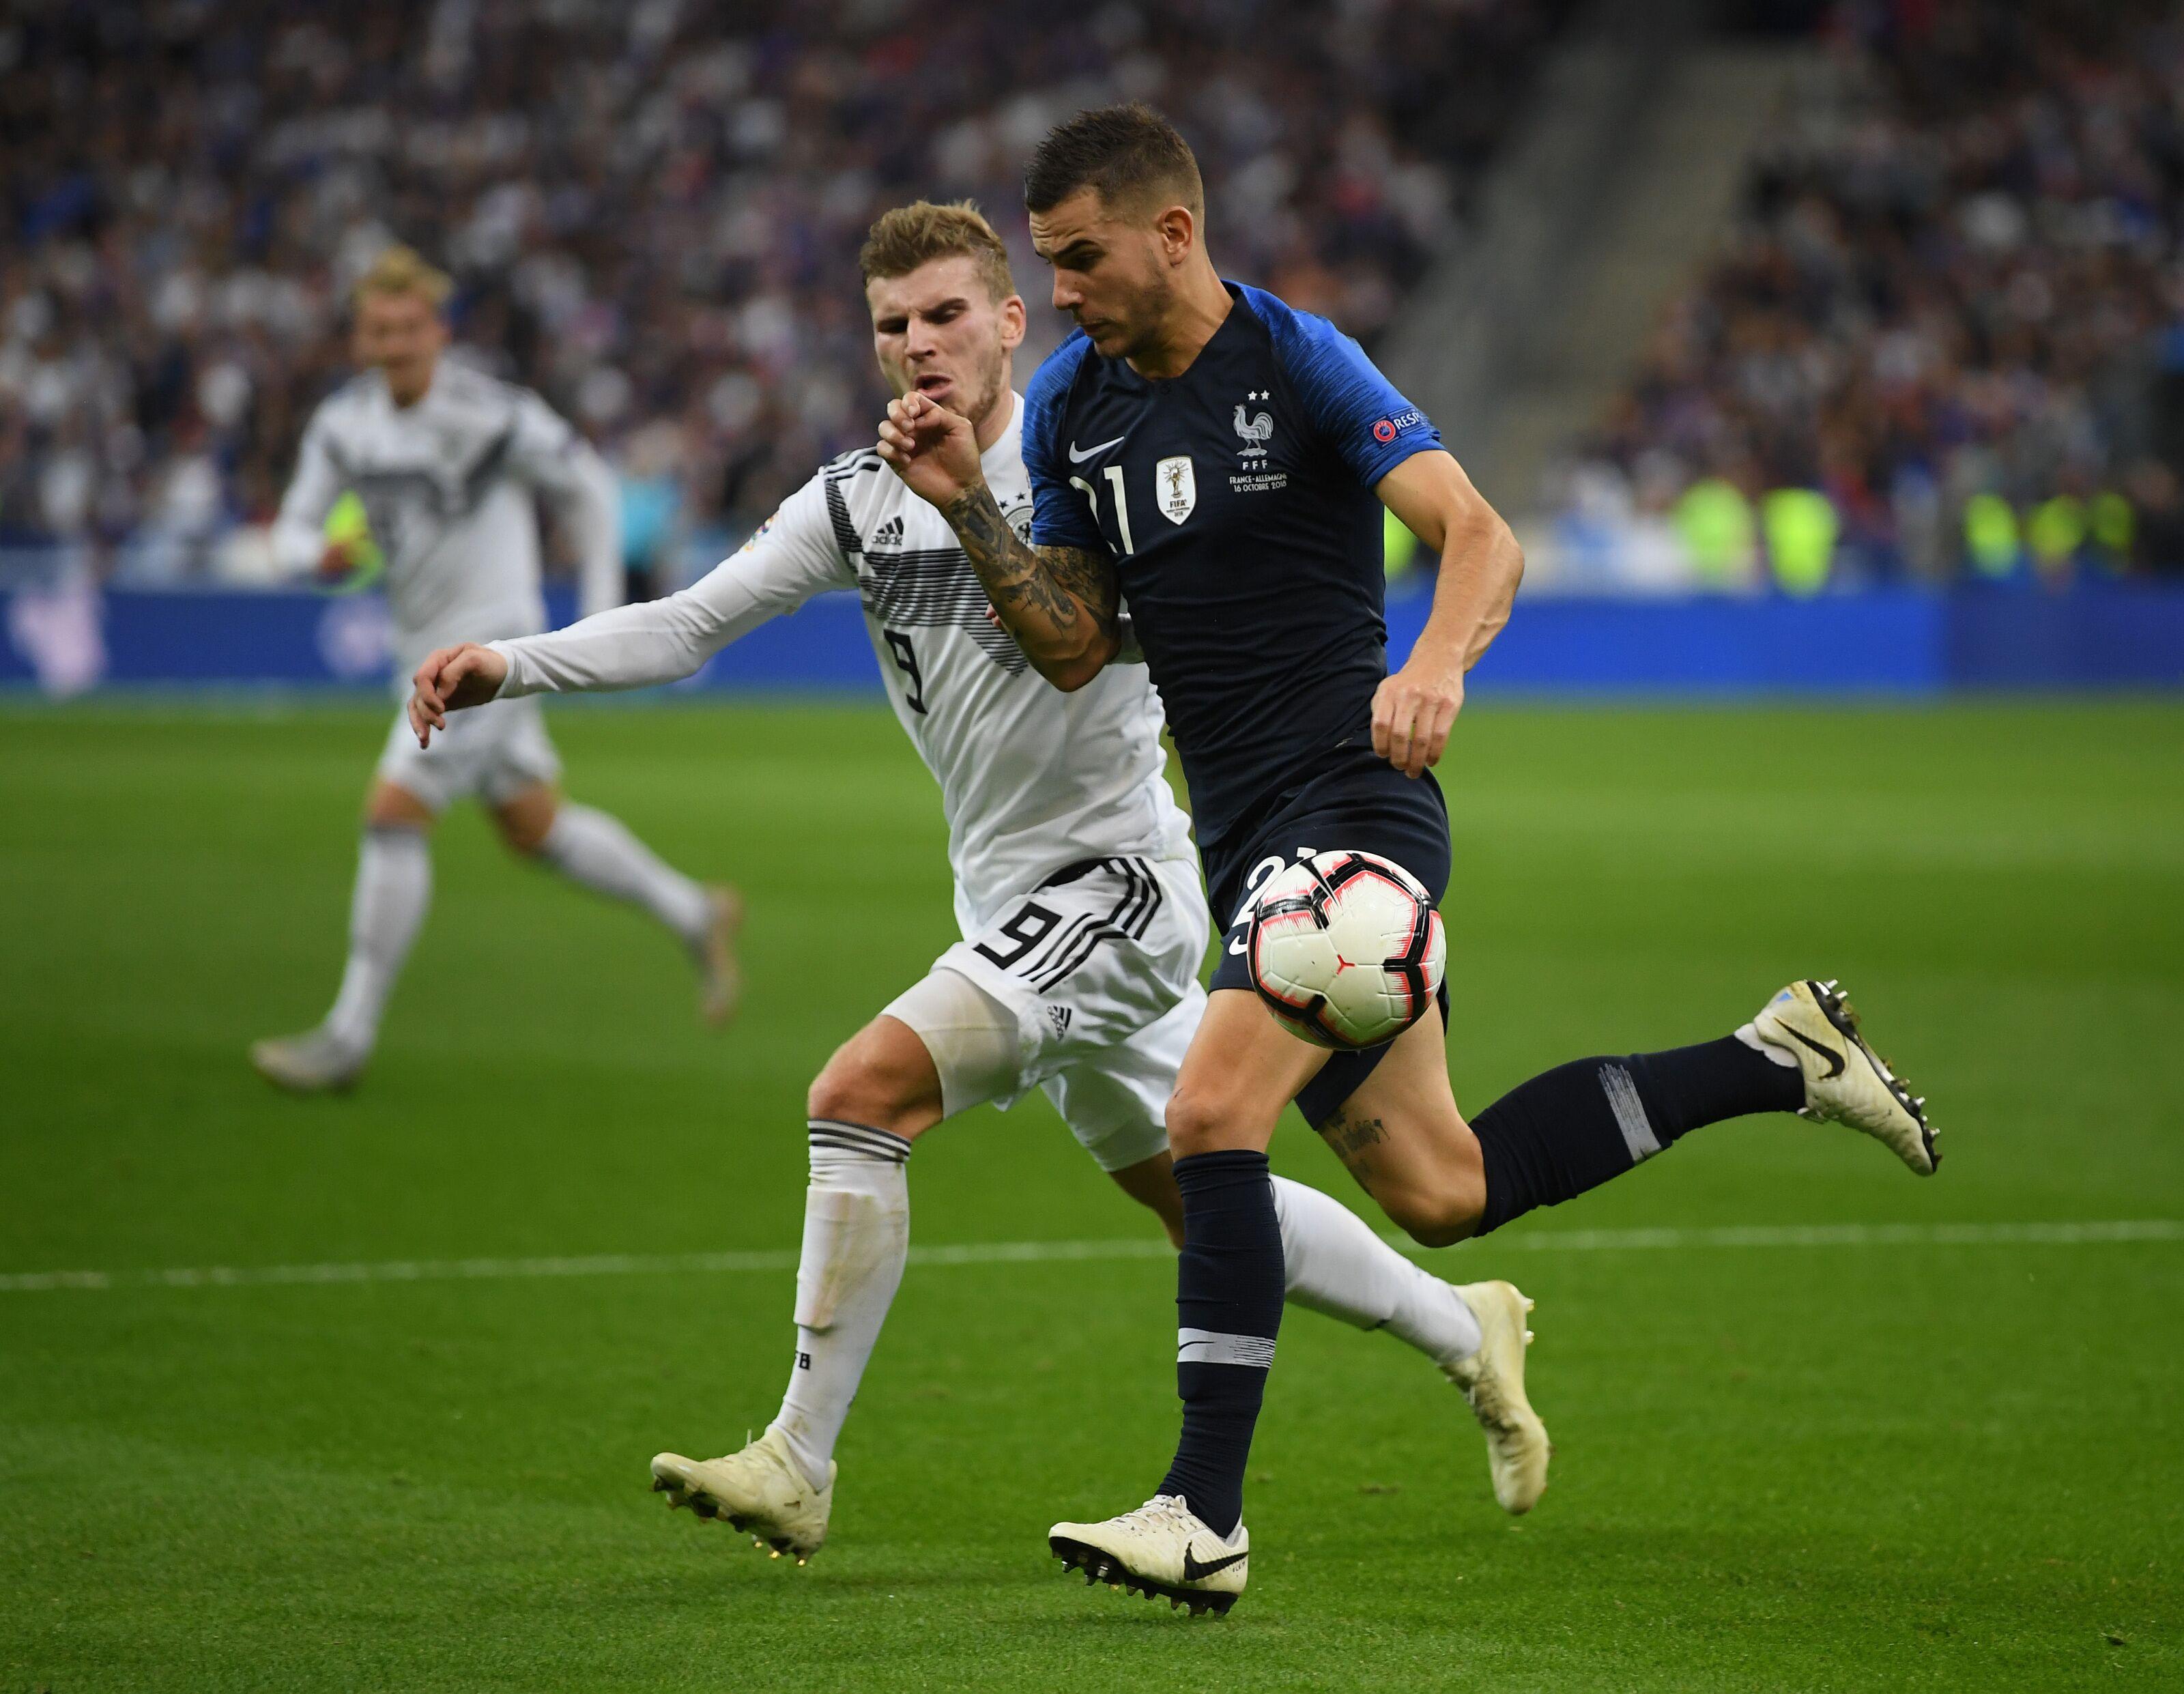 Lucas Hernandez is a great signing for Bayern Munich says Bixente Lizarazu